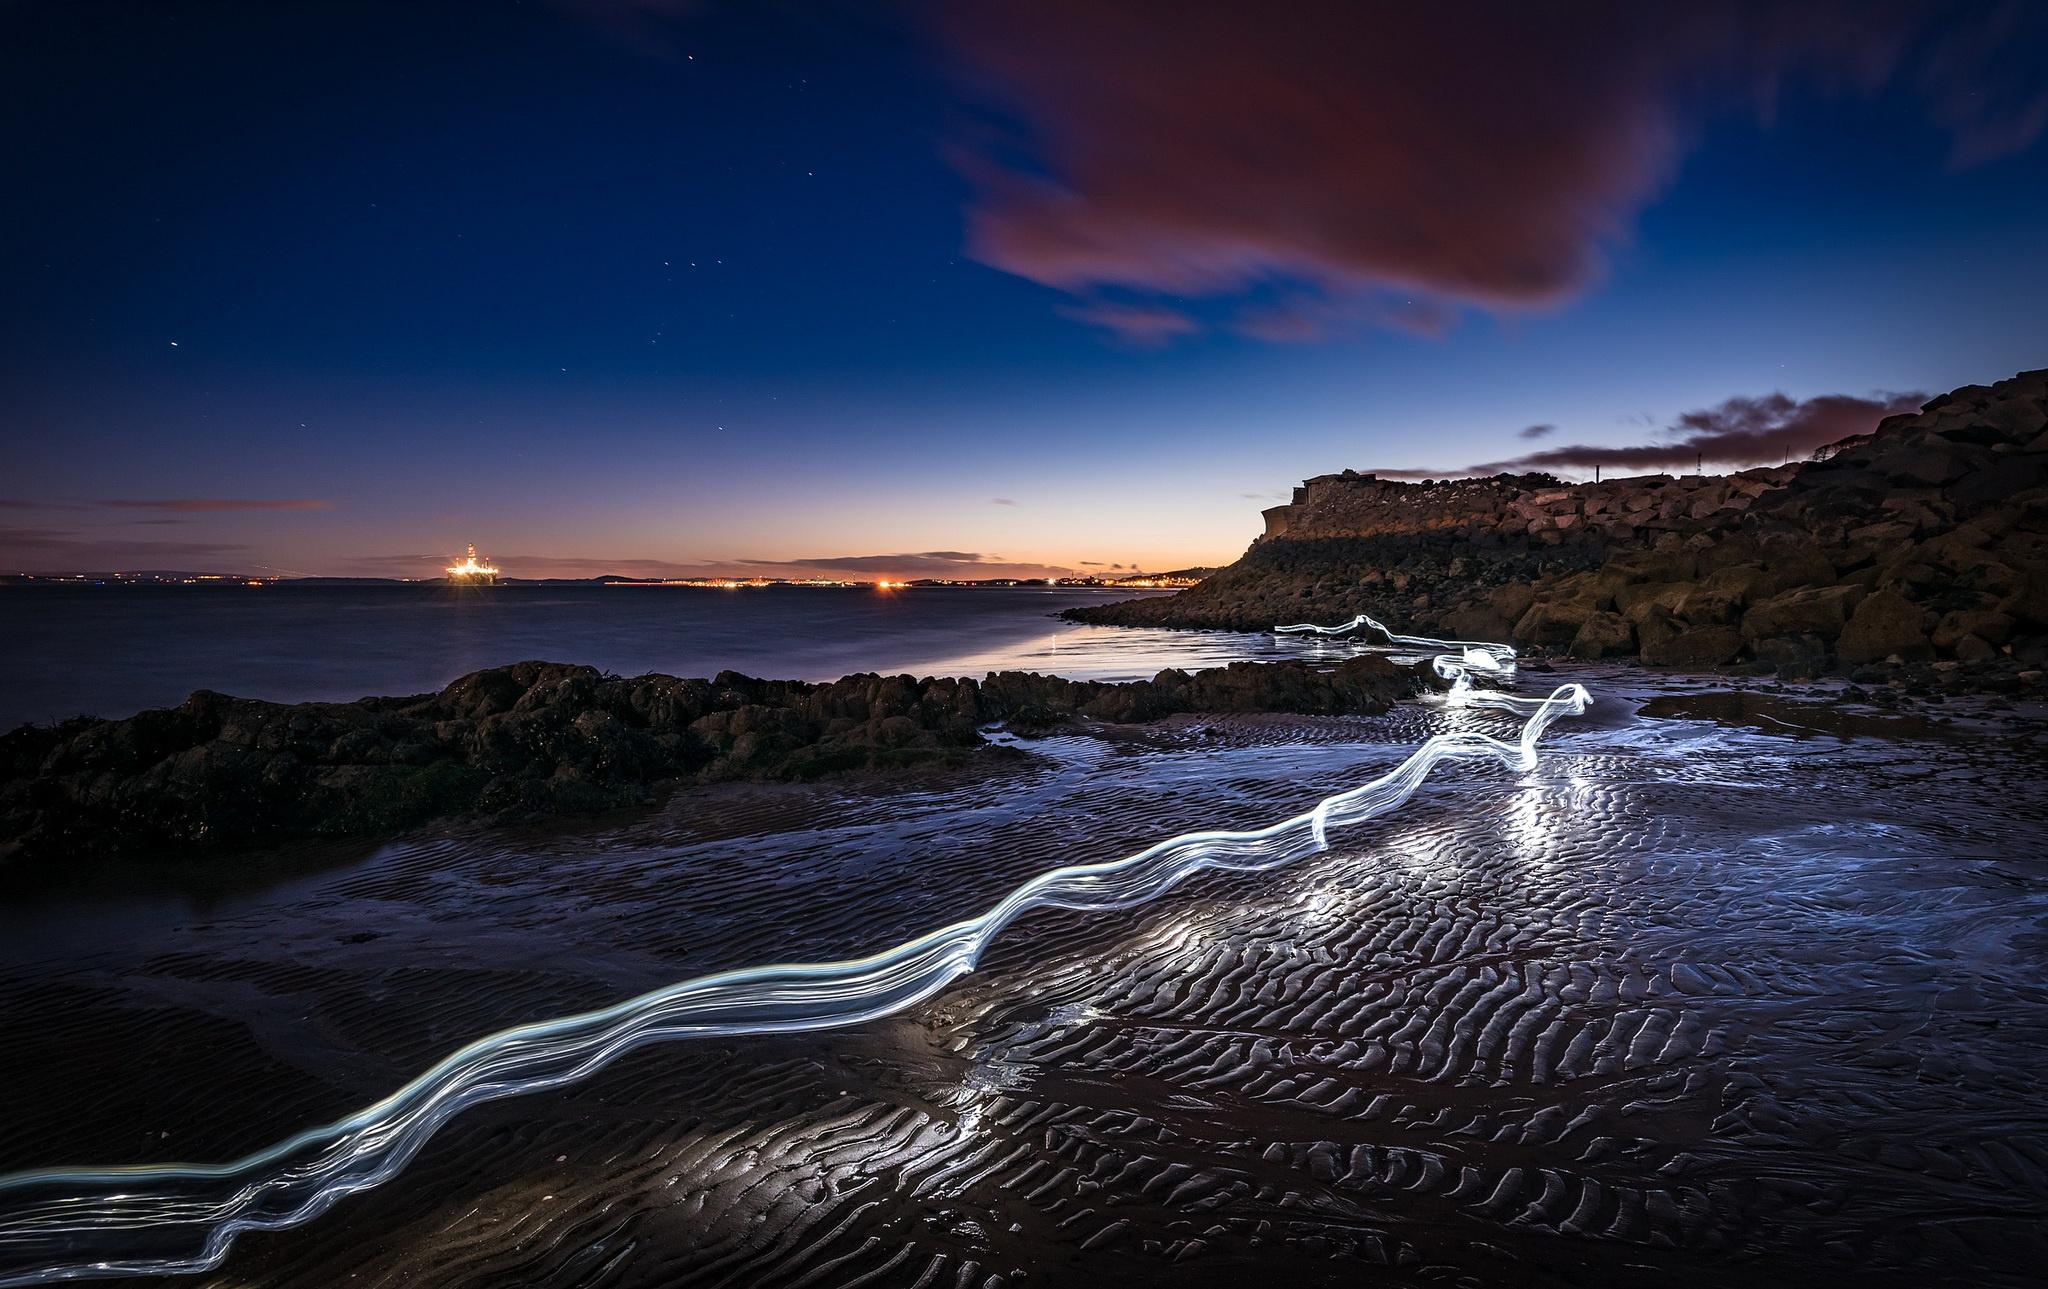 Beach Nature Night Time Lapse 2048x1289